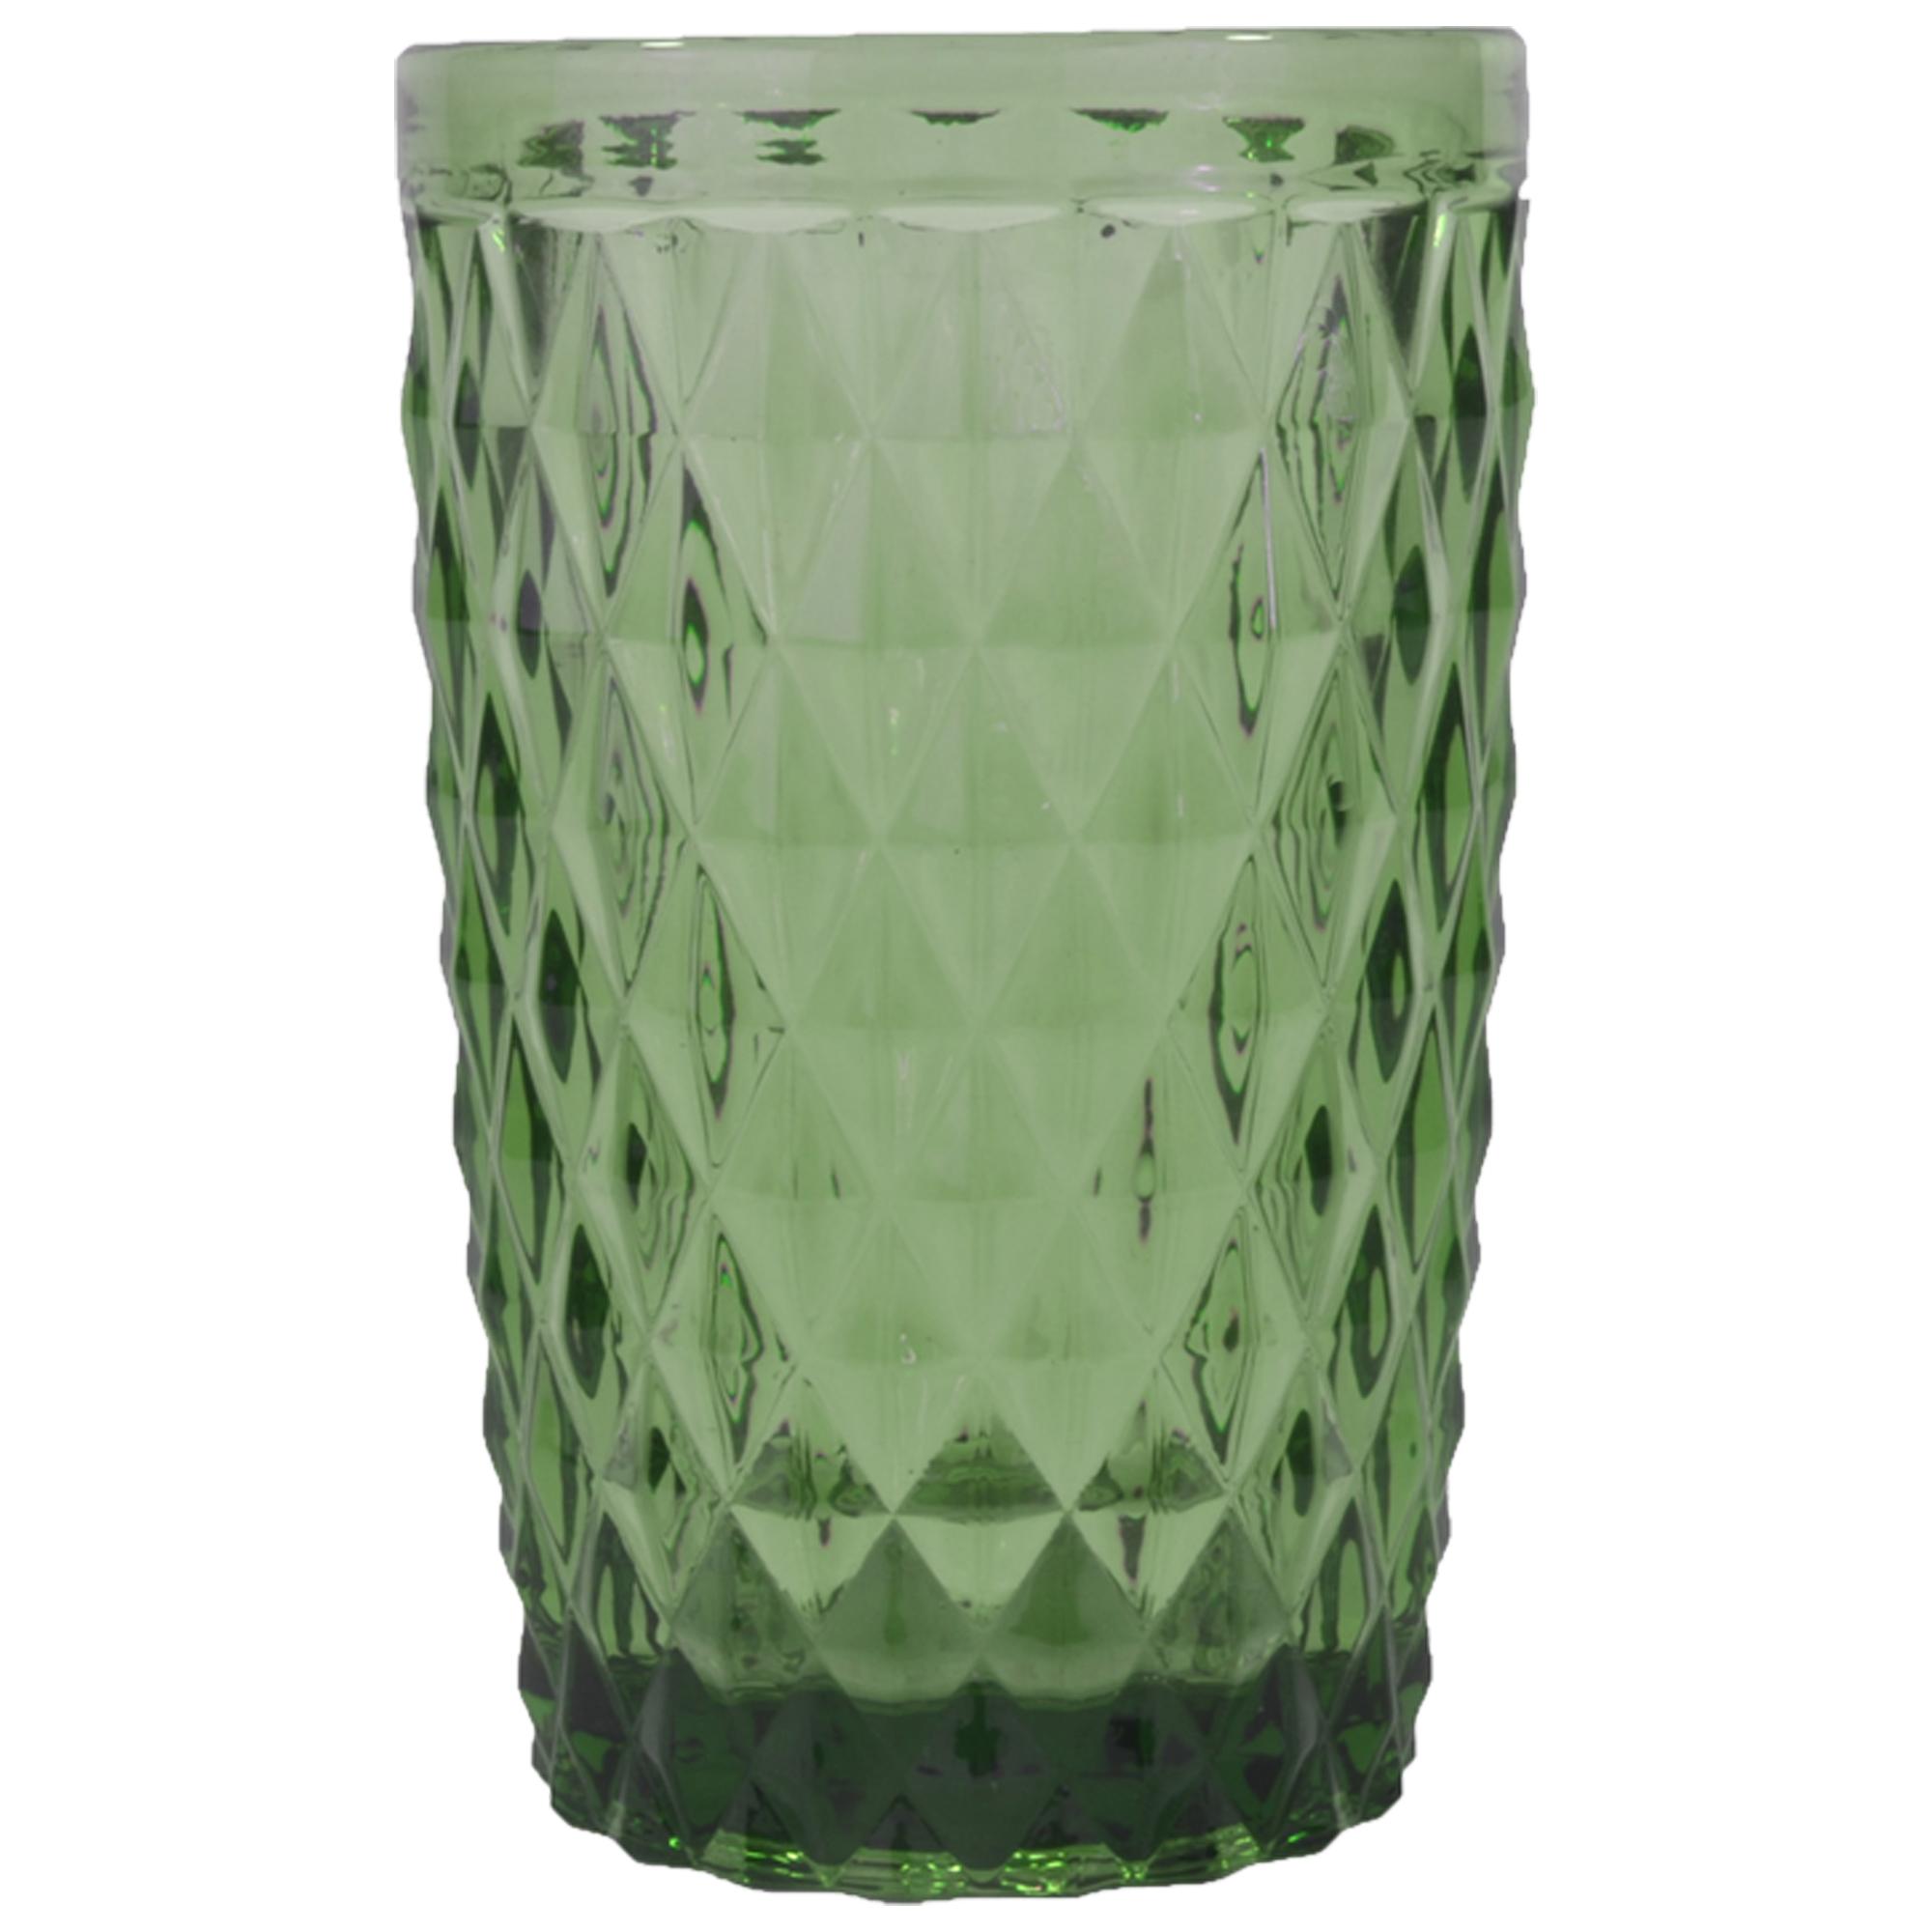 Chope en verre pressé vert 34 cl - Lot de 6